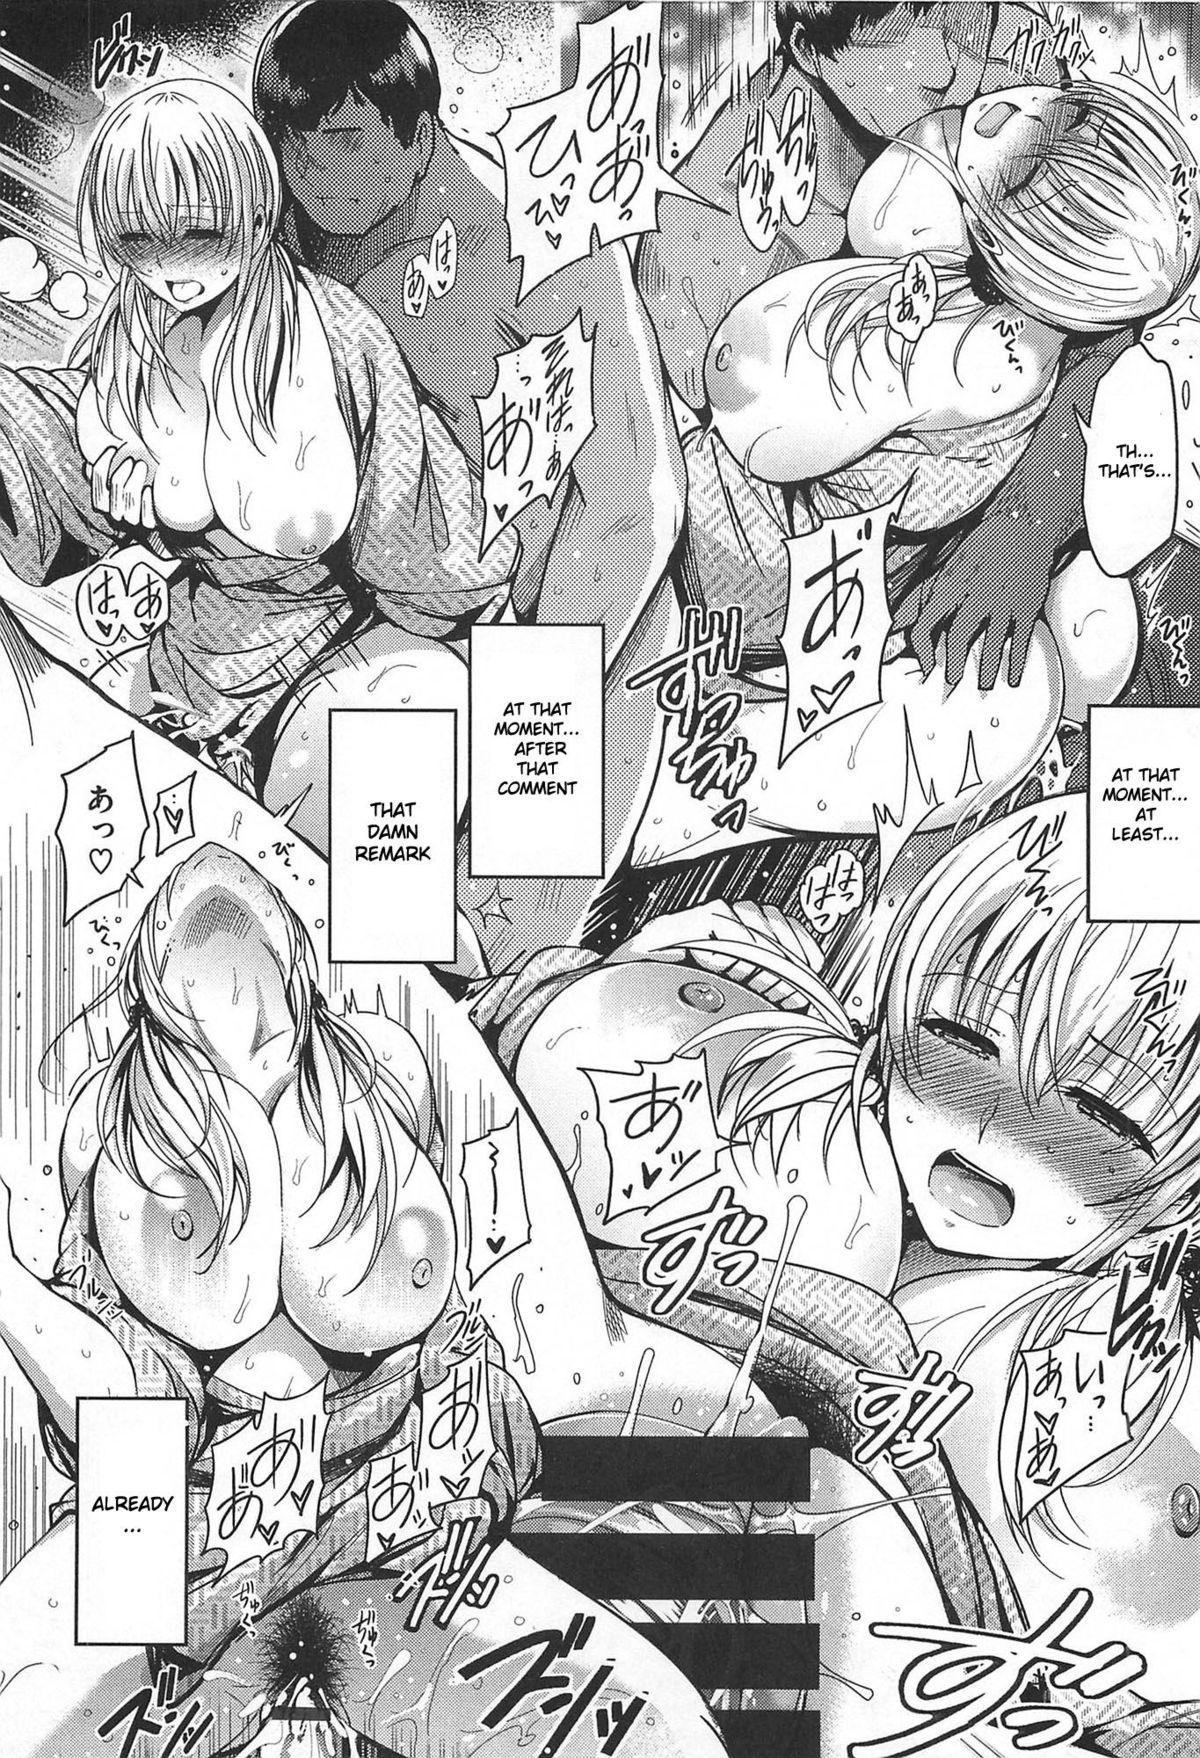 [Ichimatsu] [For my Husband's Sake] 21